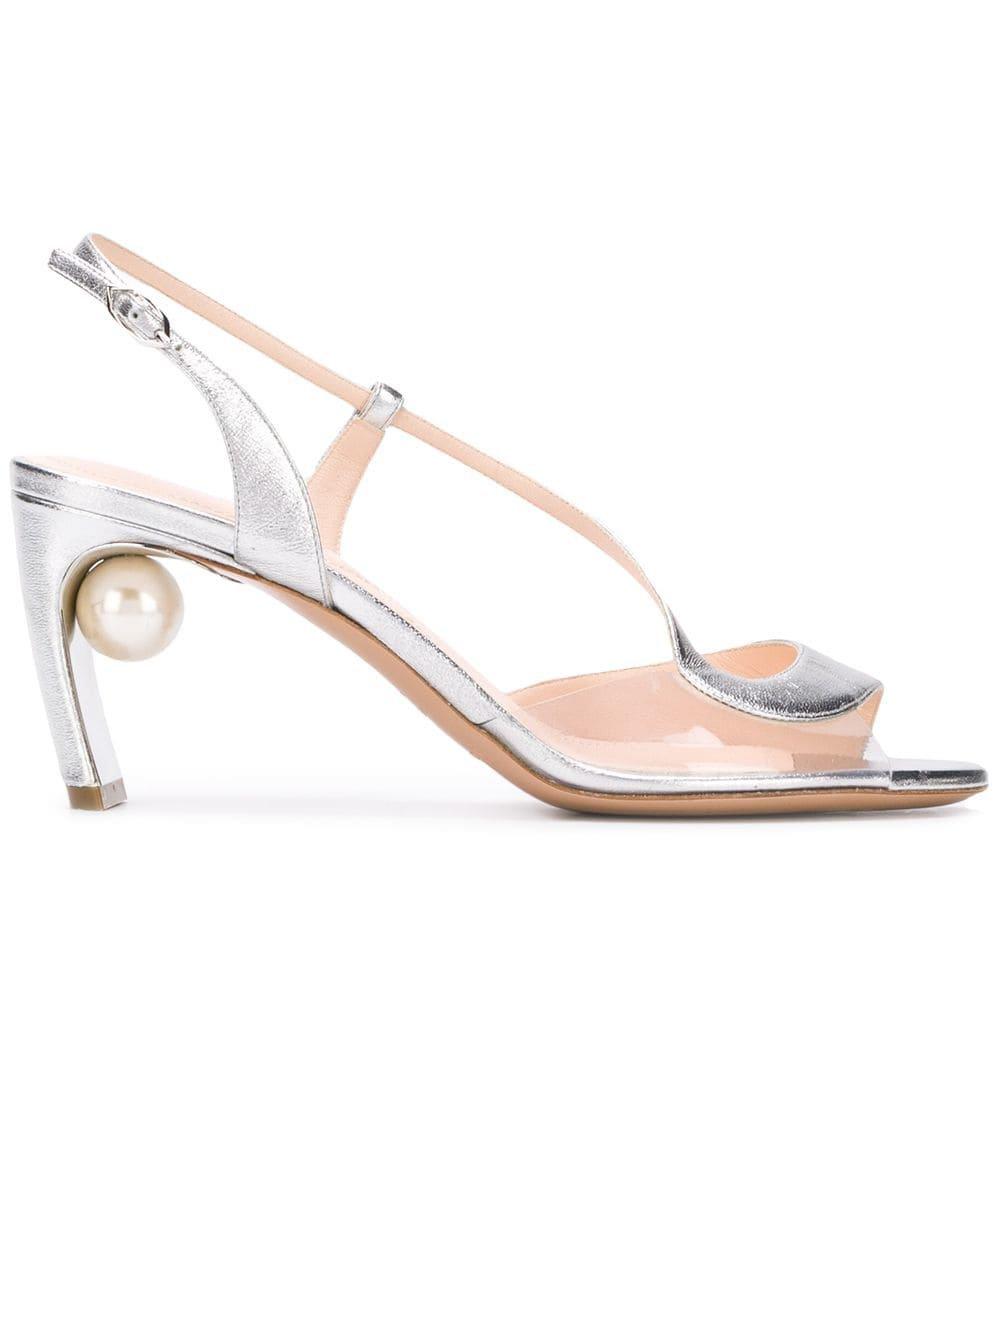 Nicholas Kirkwood Embellished Sandals